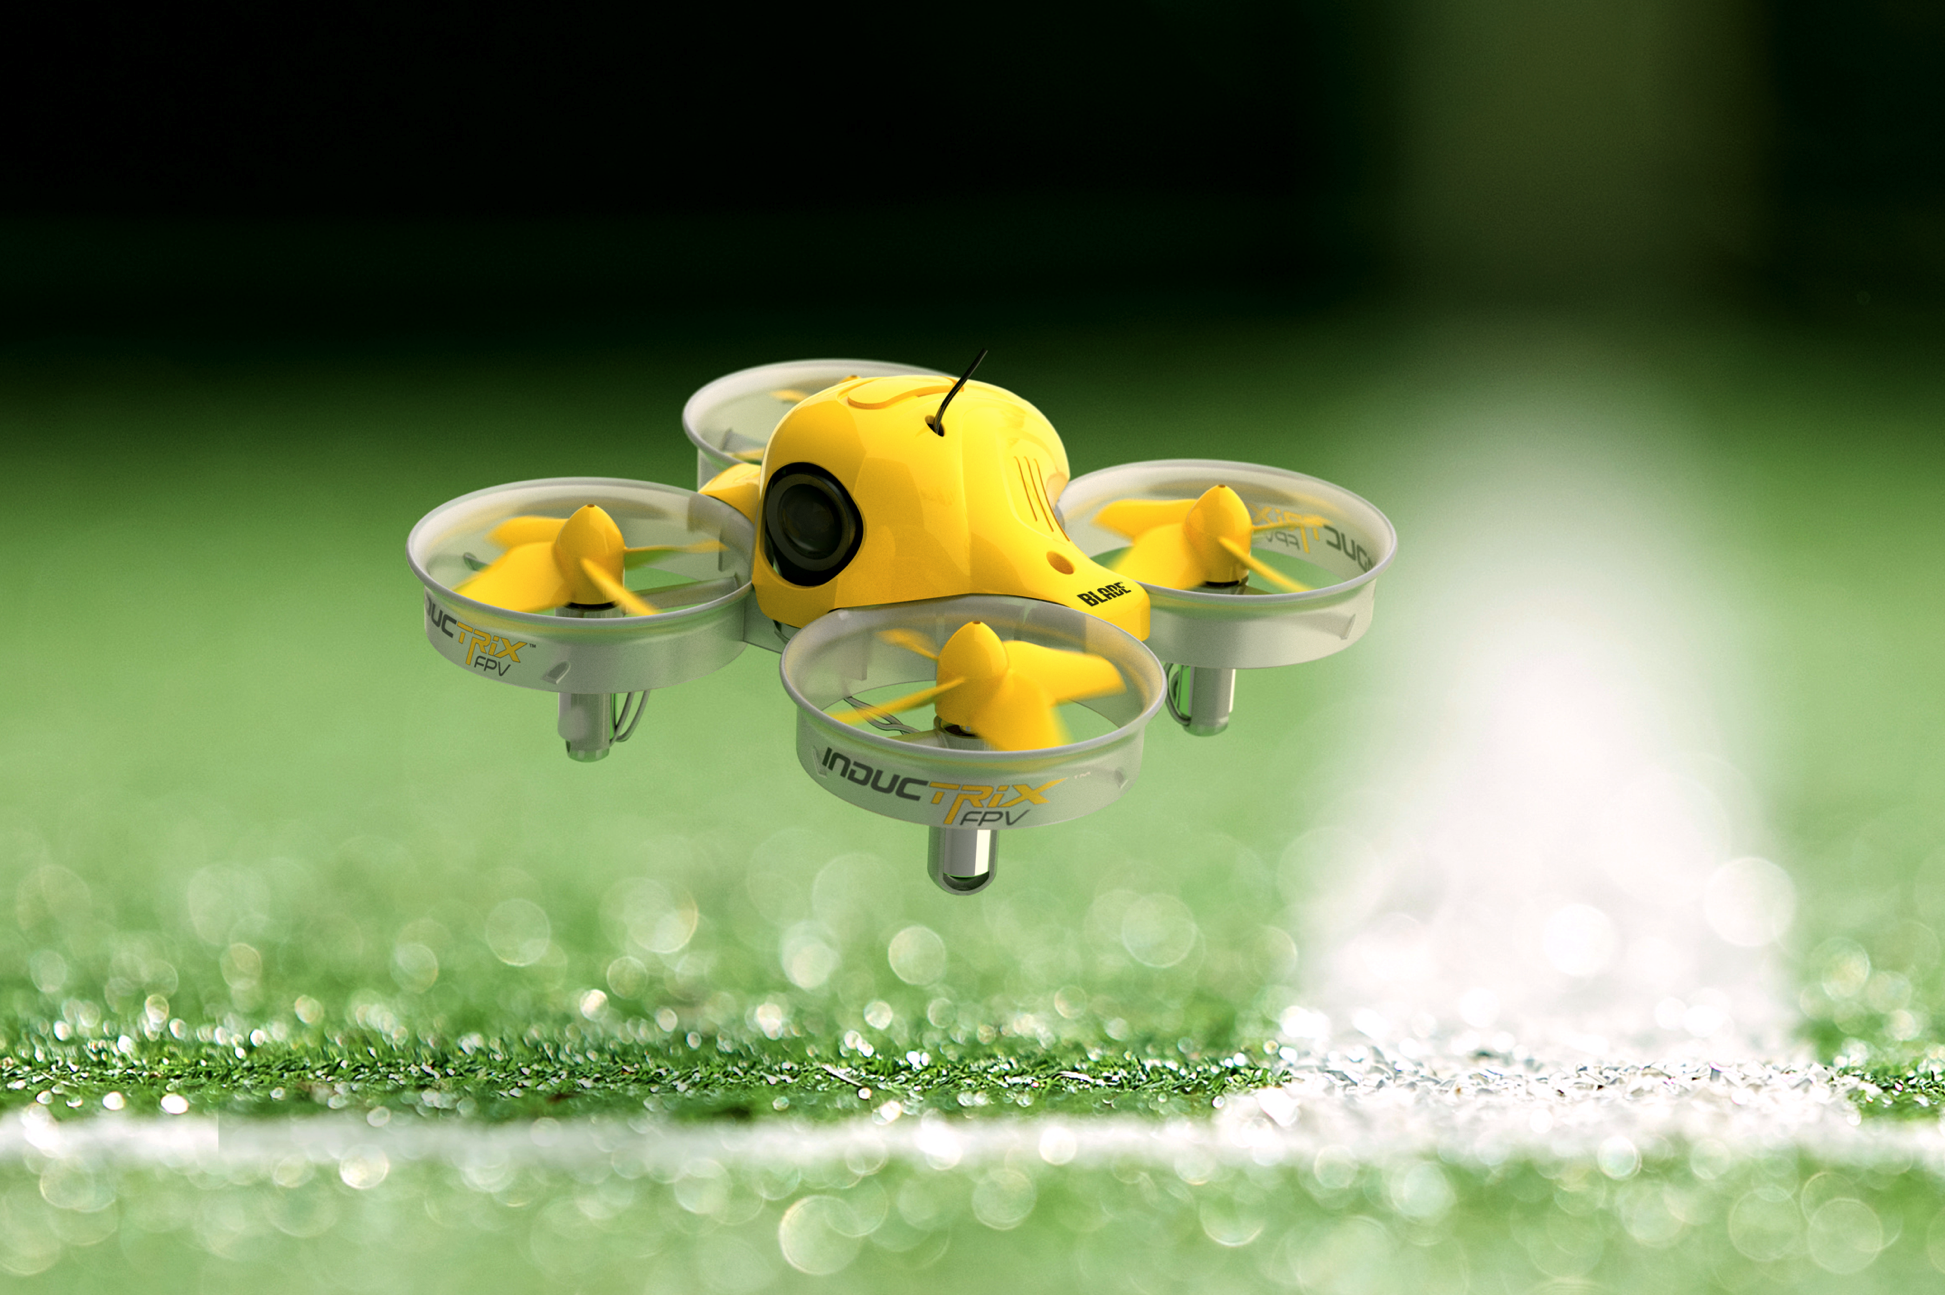 Inductrix Drone CGI